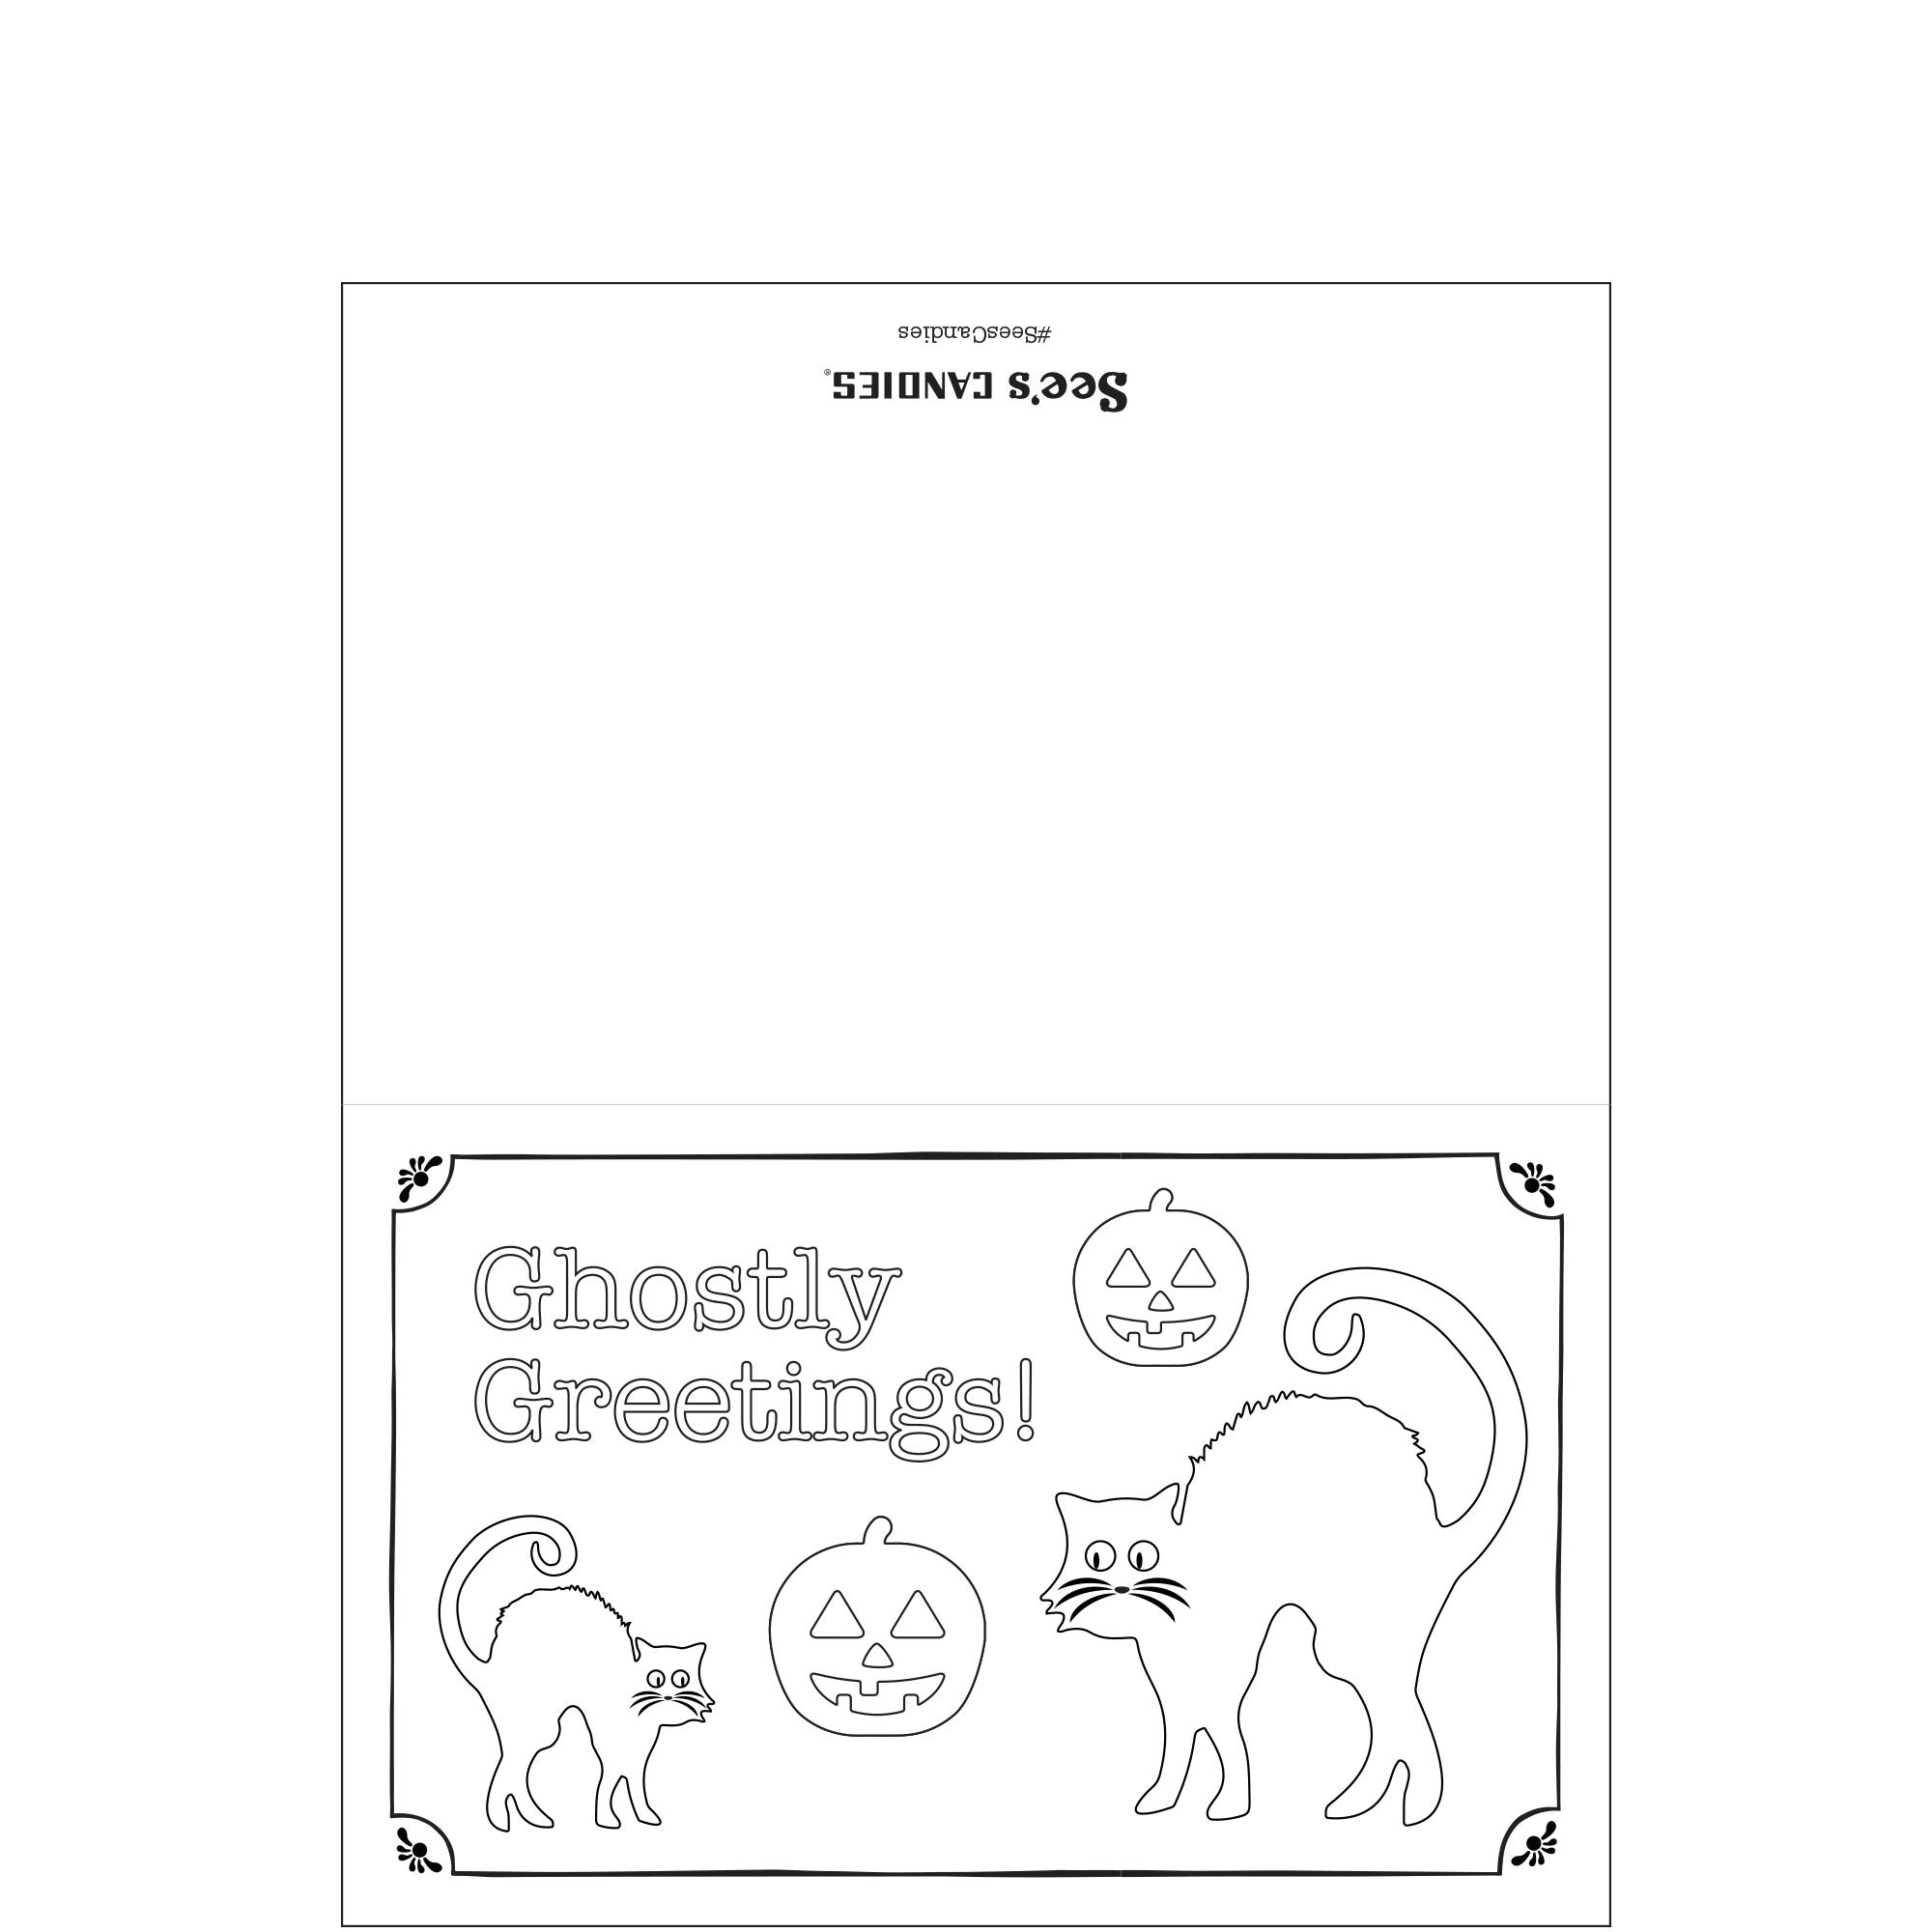 Ghostly Greetings Halloween Card